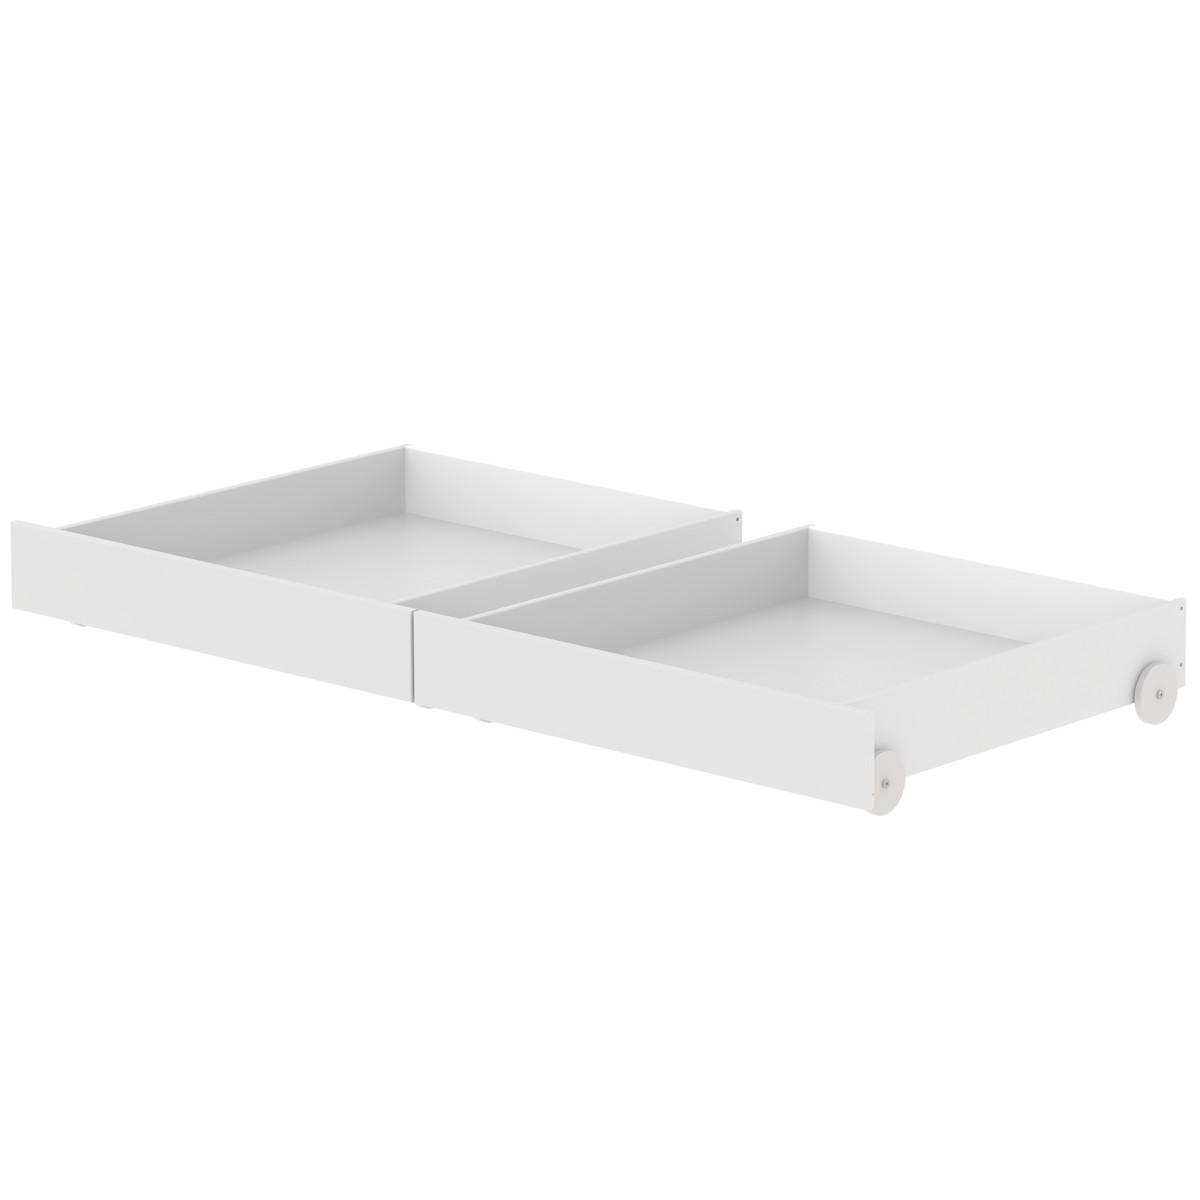 2 tiroirs lit 90x190cm WHITE Flexa blanc